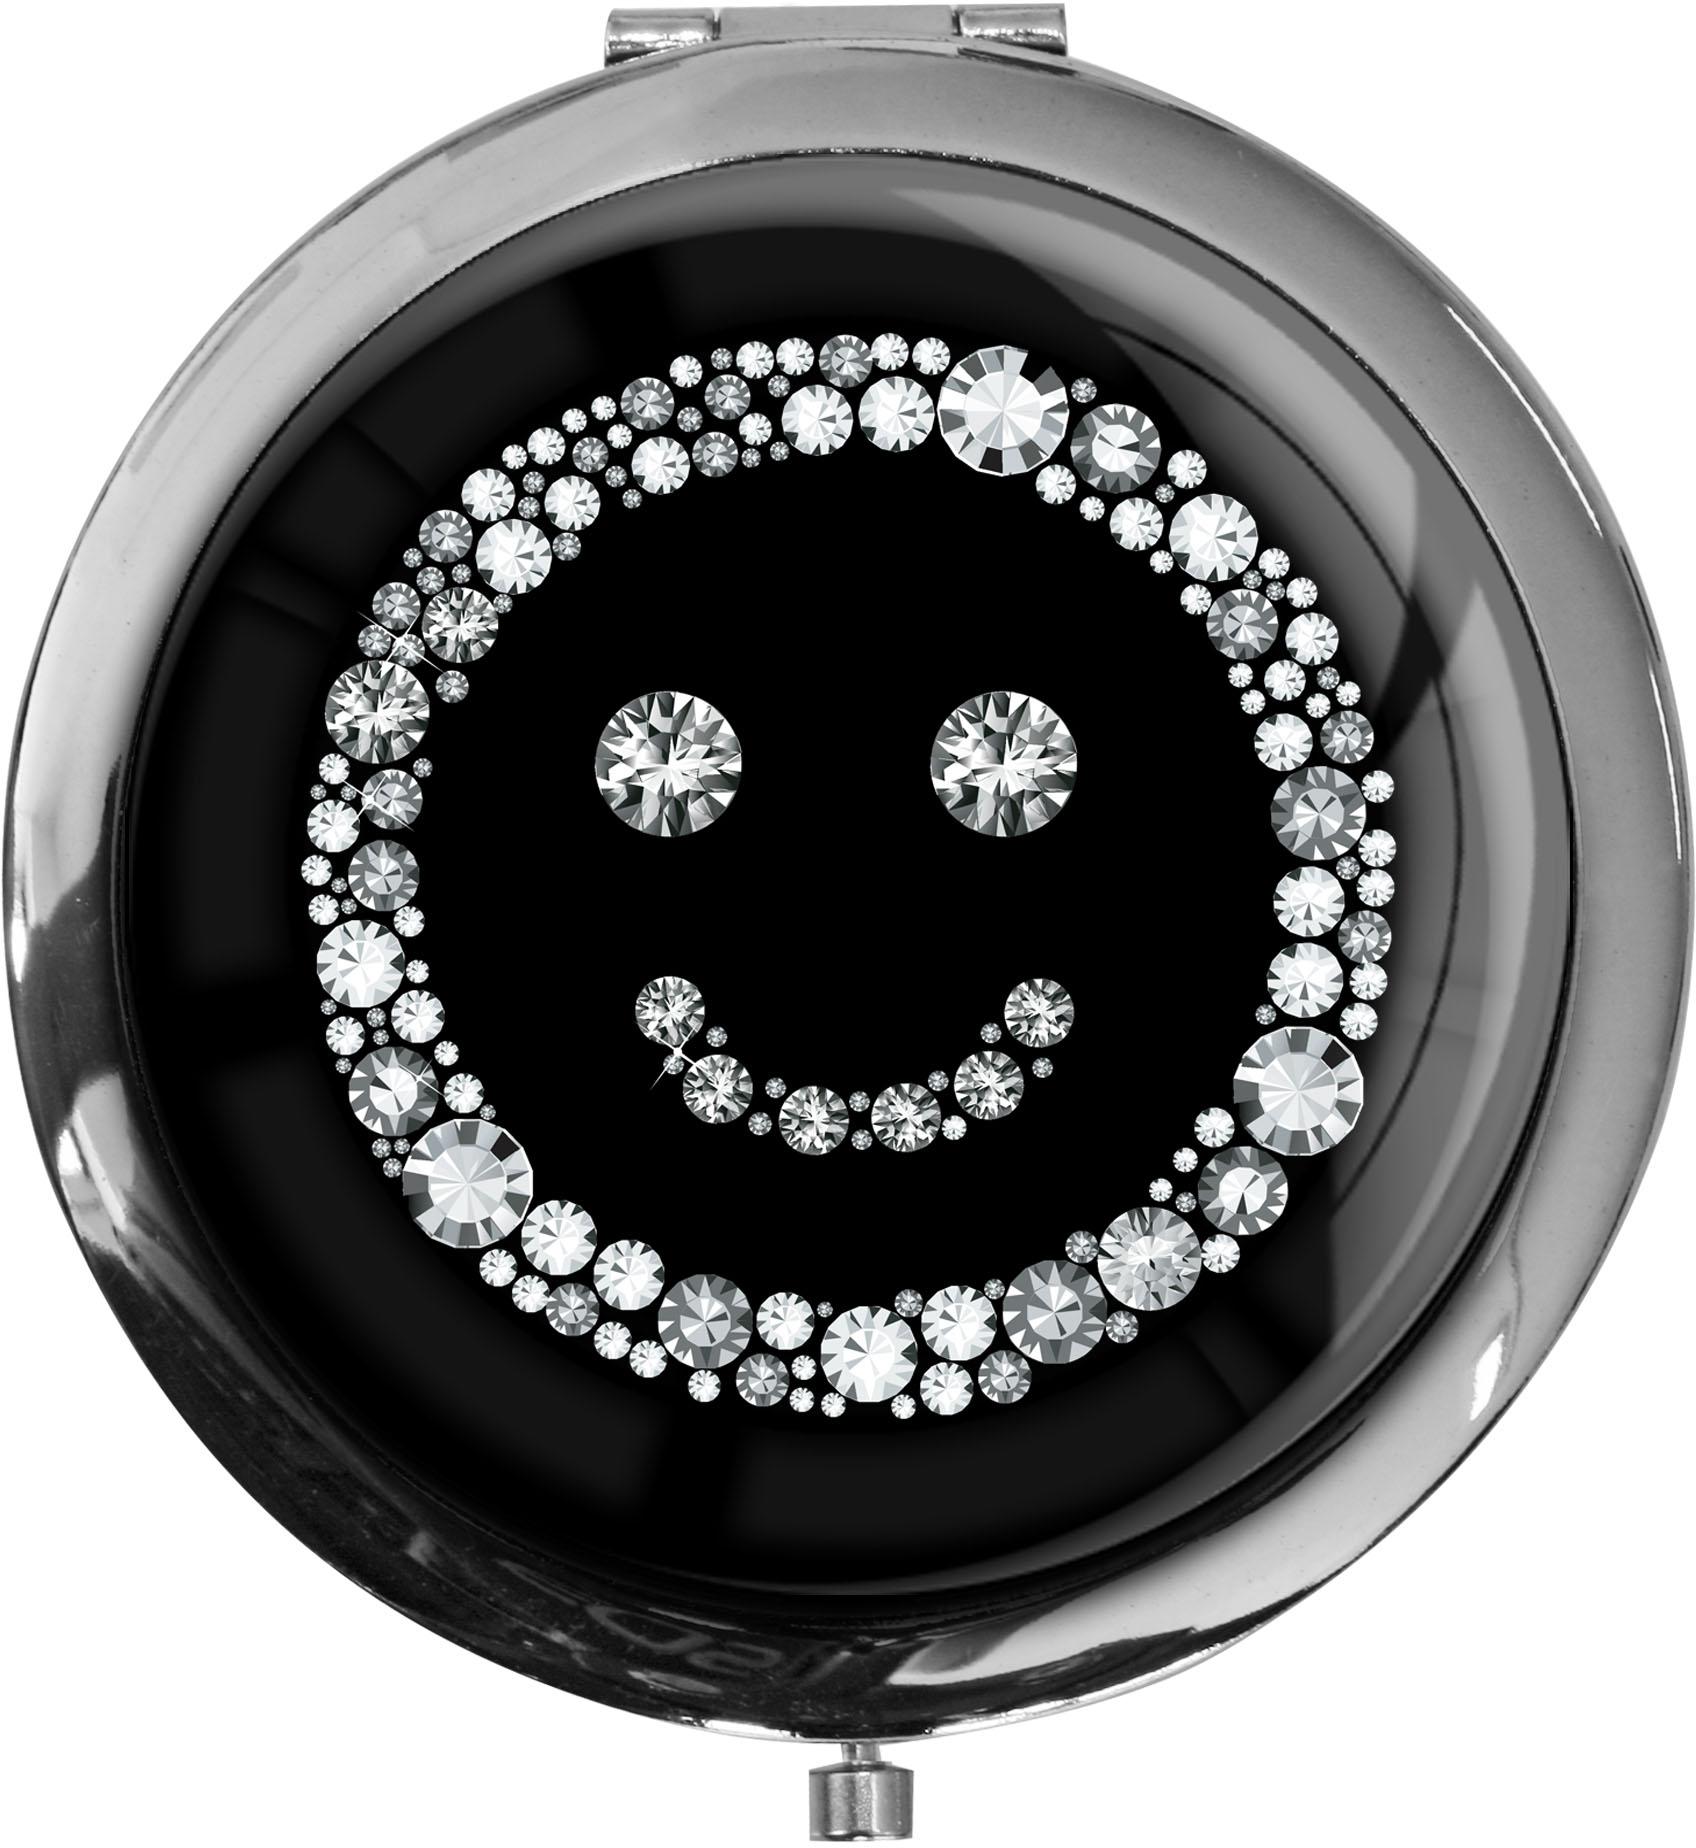 "metALUm - Extragroße Pillendose in runder Form ""Smiley in Silber"""